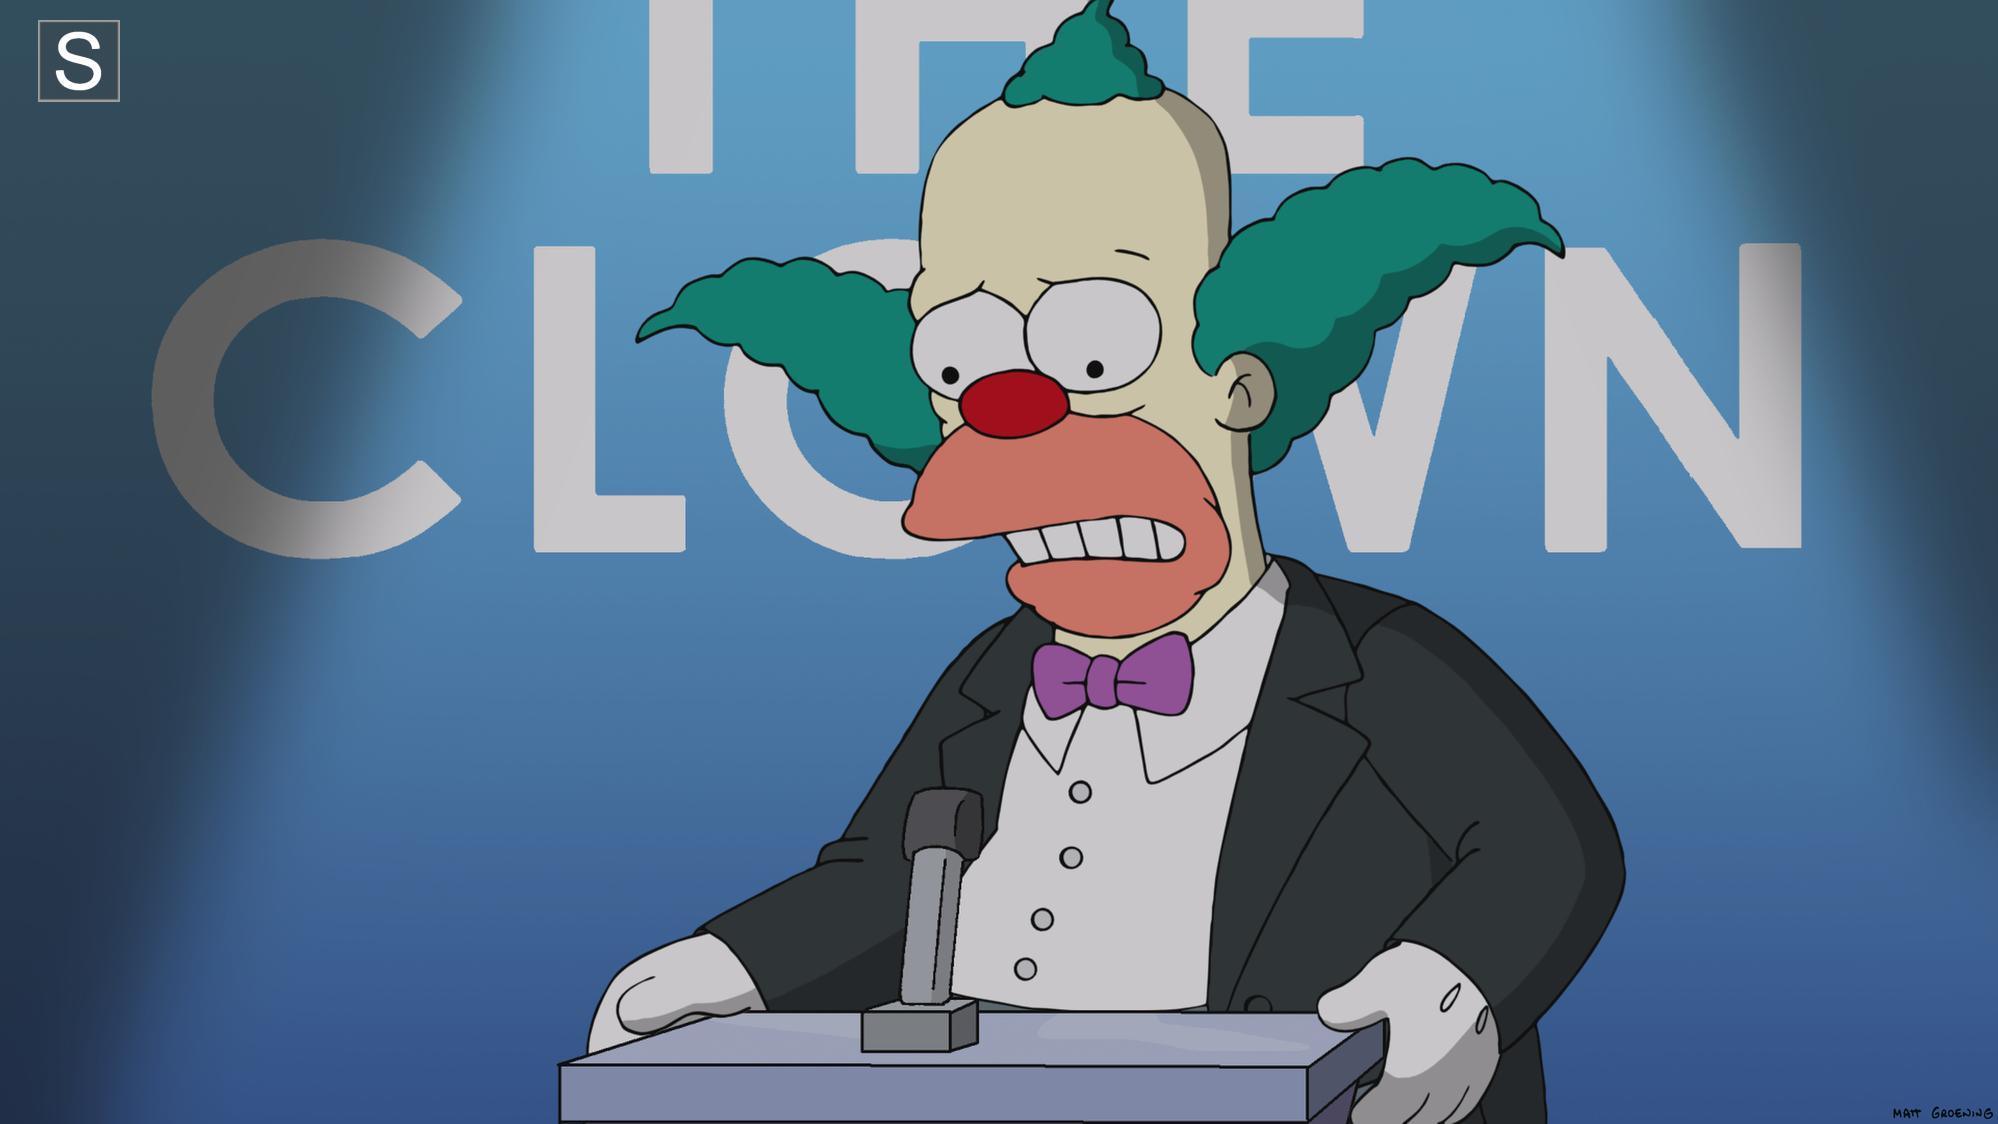 Clown in the Dumps.